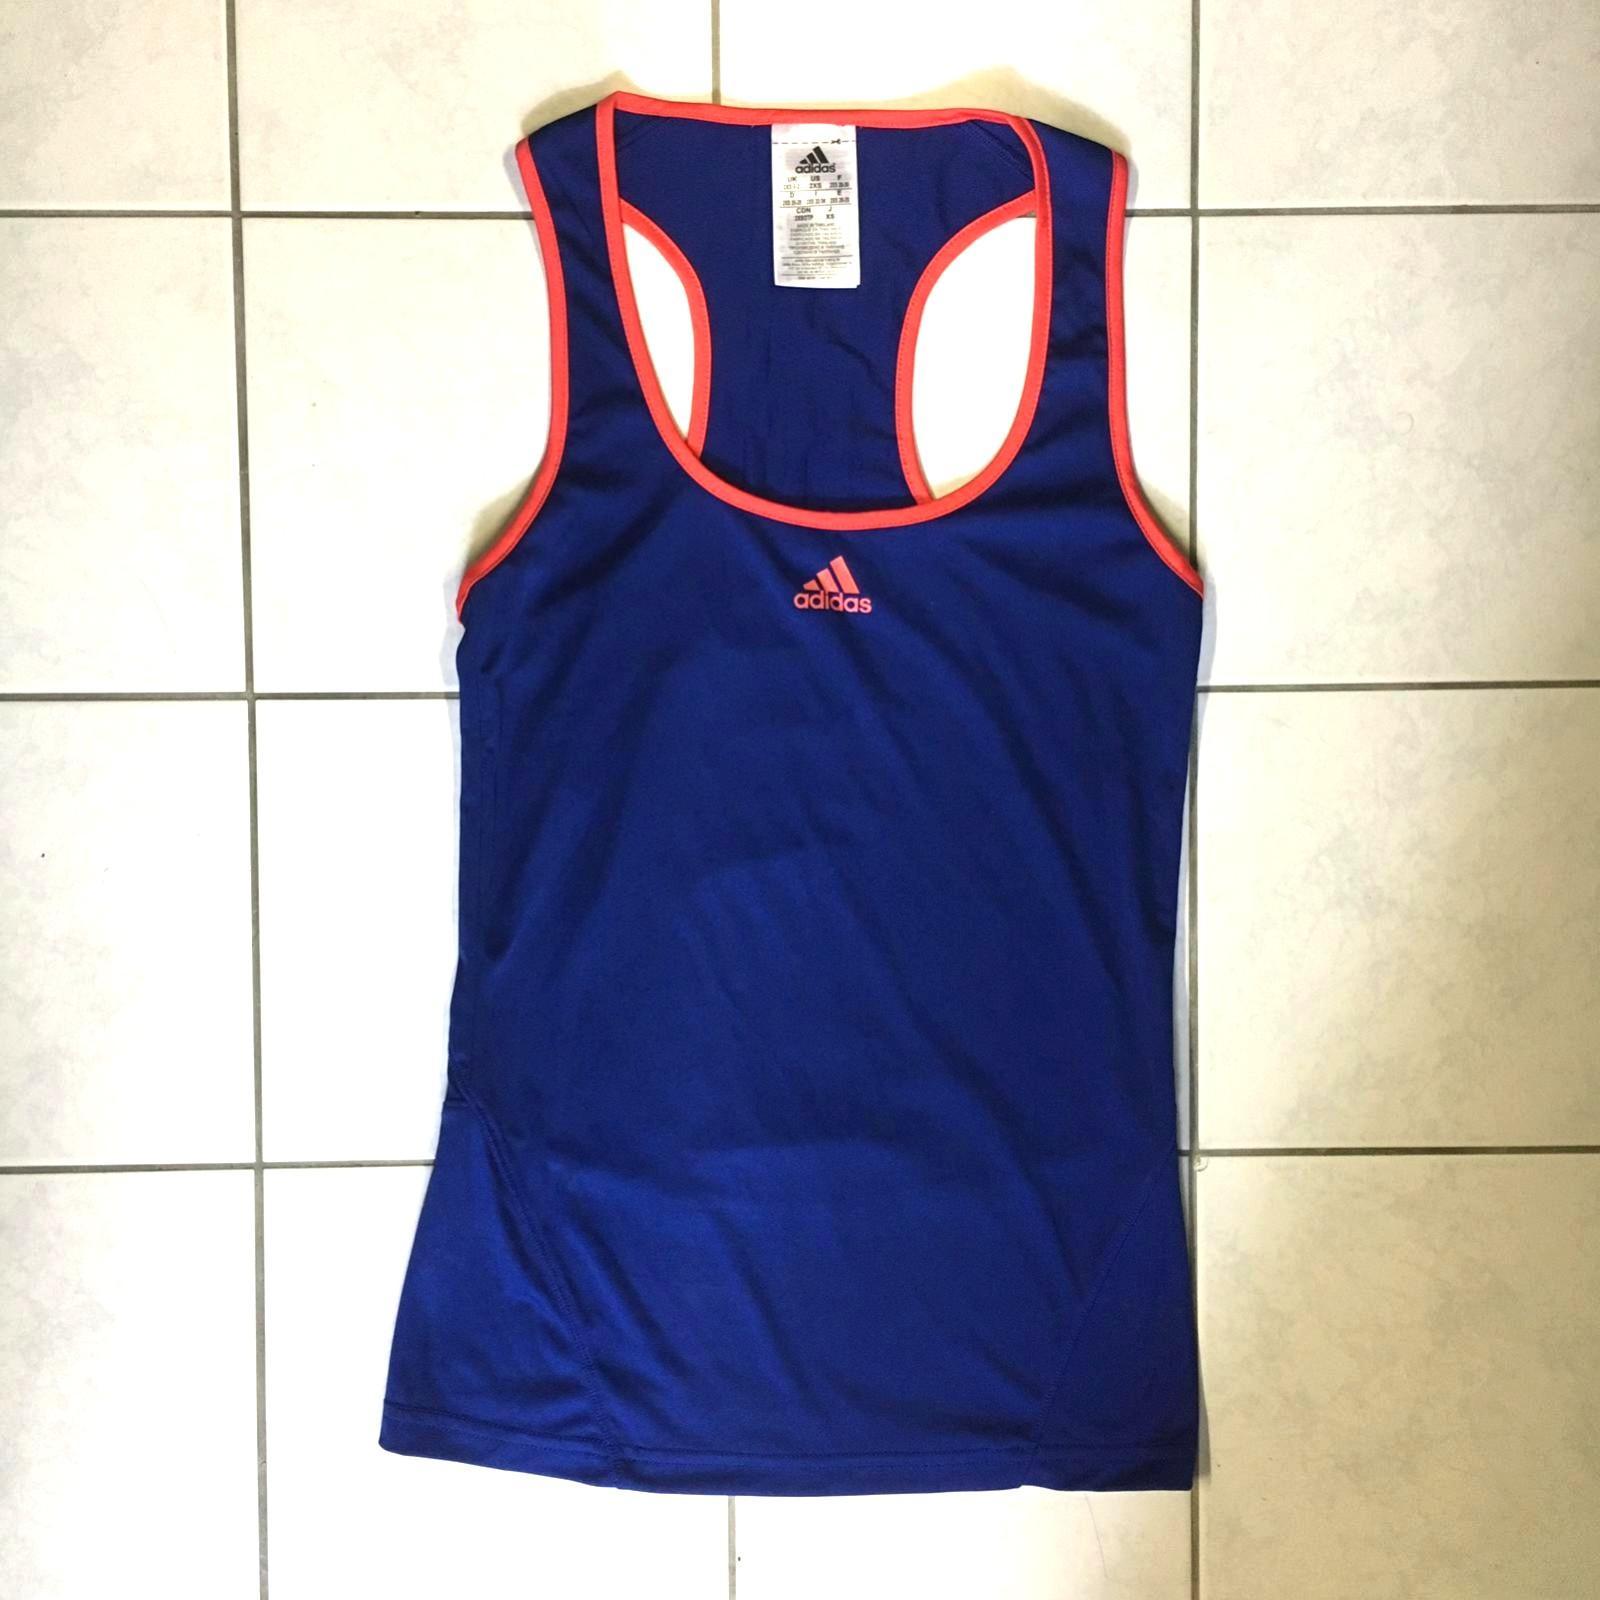 pretty nice c10a2 175fa Adidas 2XS Climacool Women's Singlet - New, Sports, Sports ...